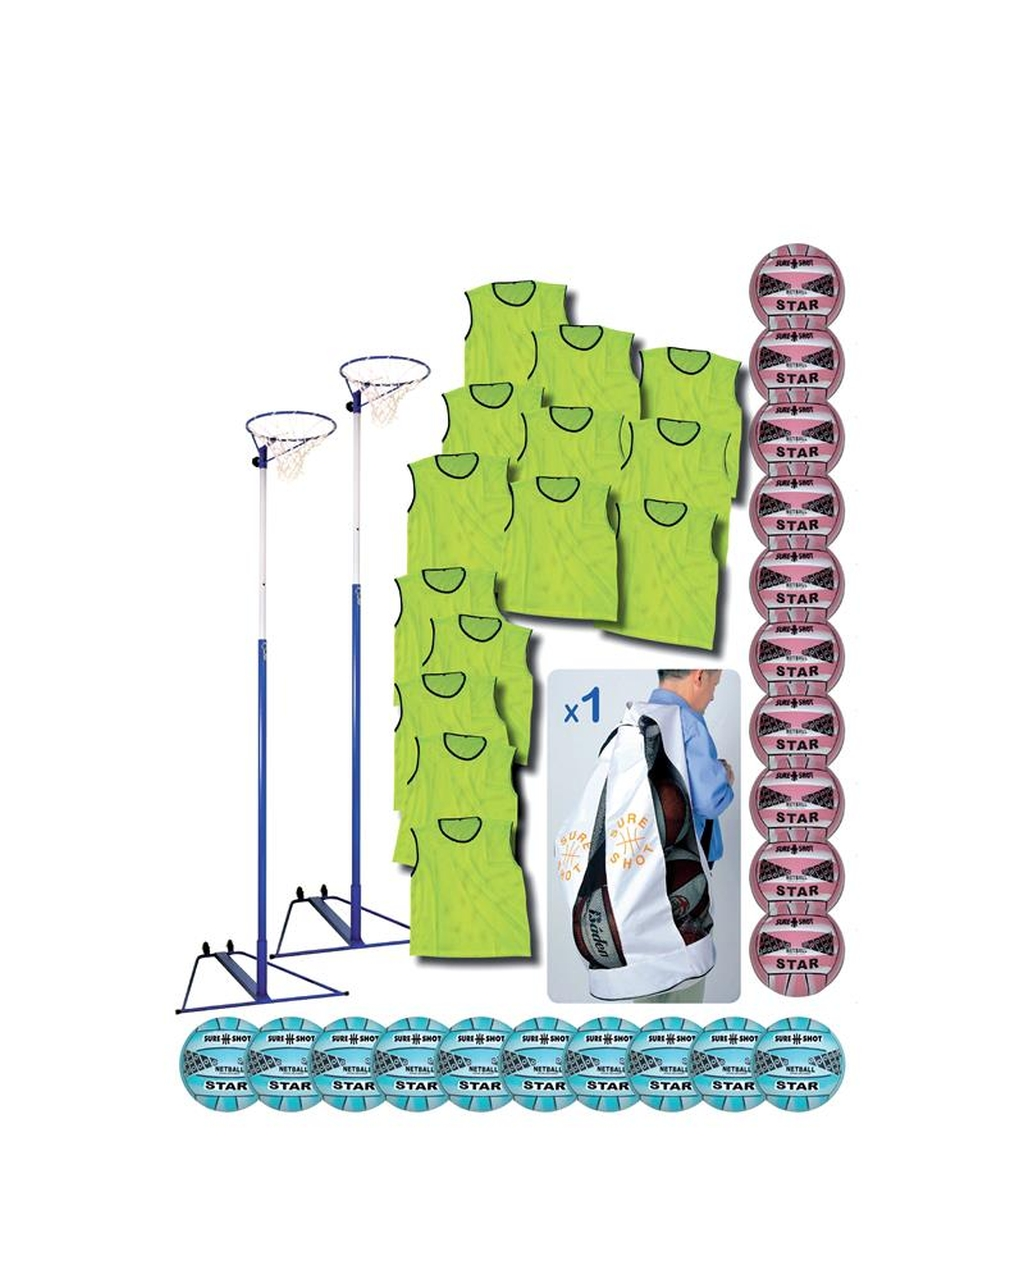 Primary Netball Kit